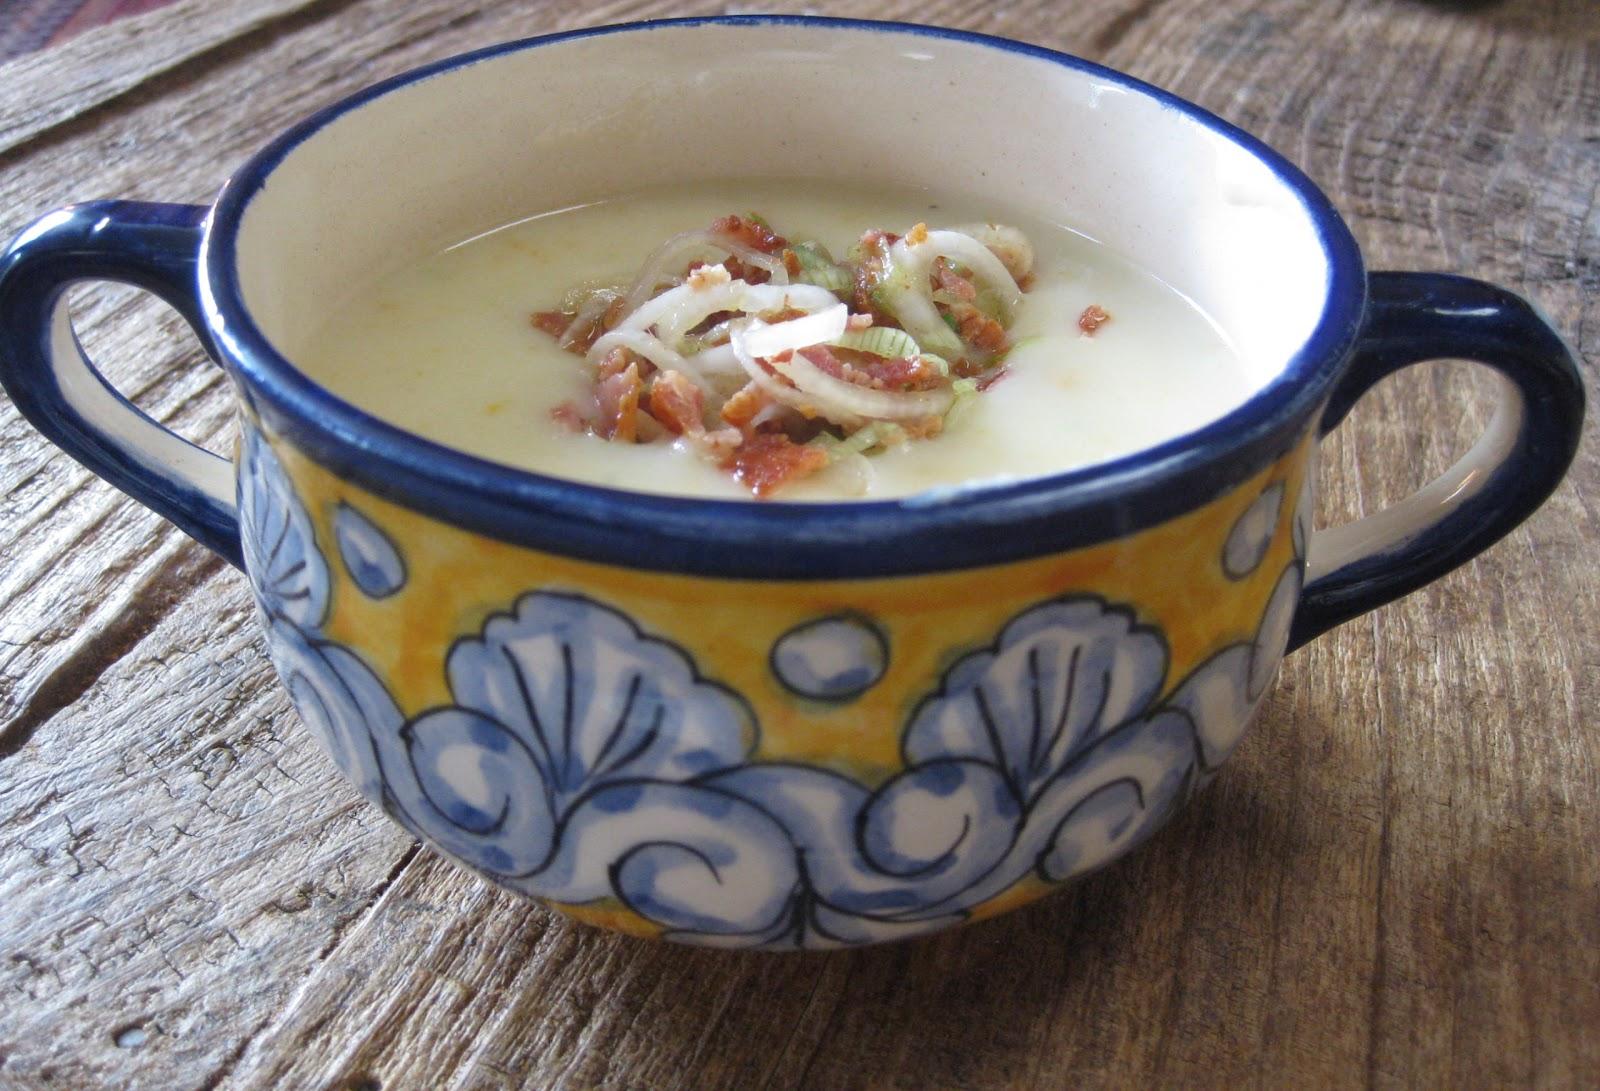 Flavors of the Sun: Creamy Potato Soup with Bacon Vinaigrette